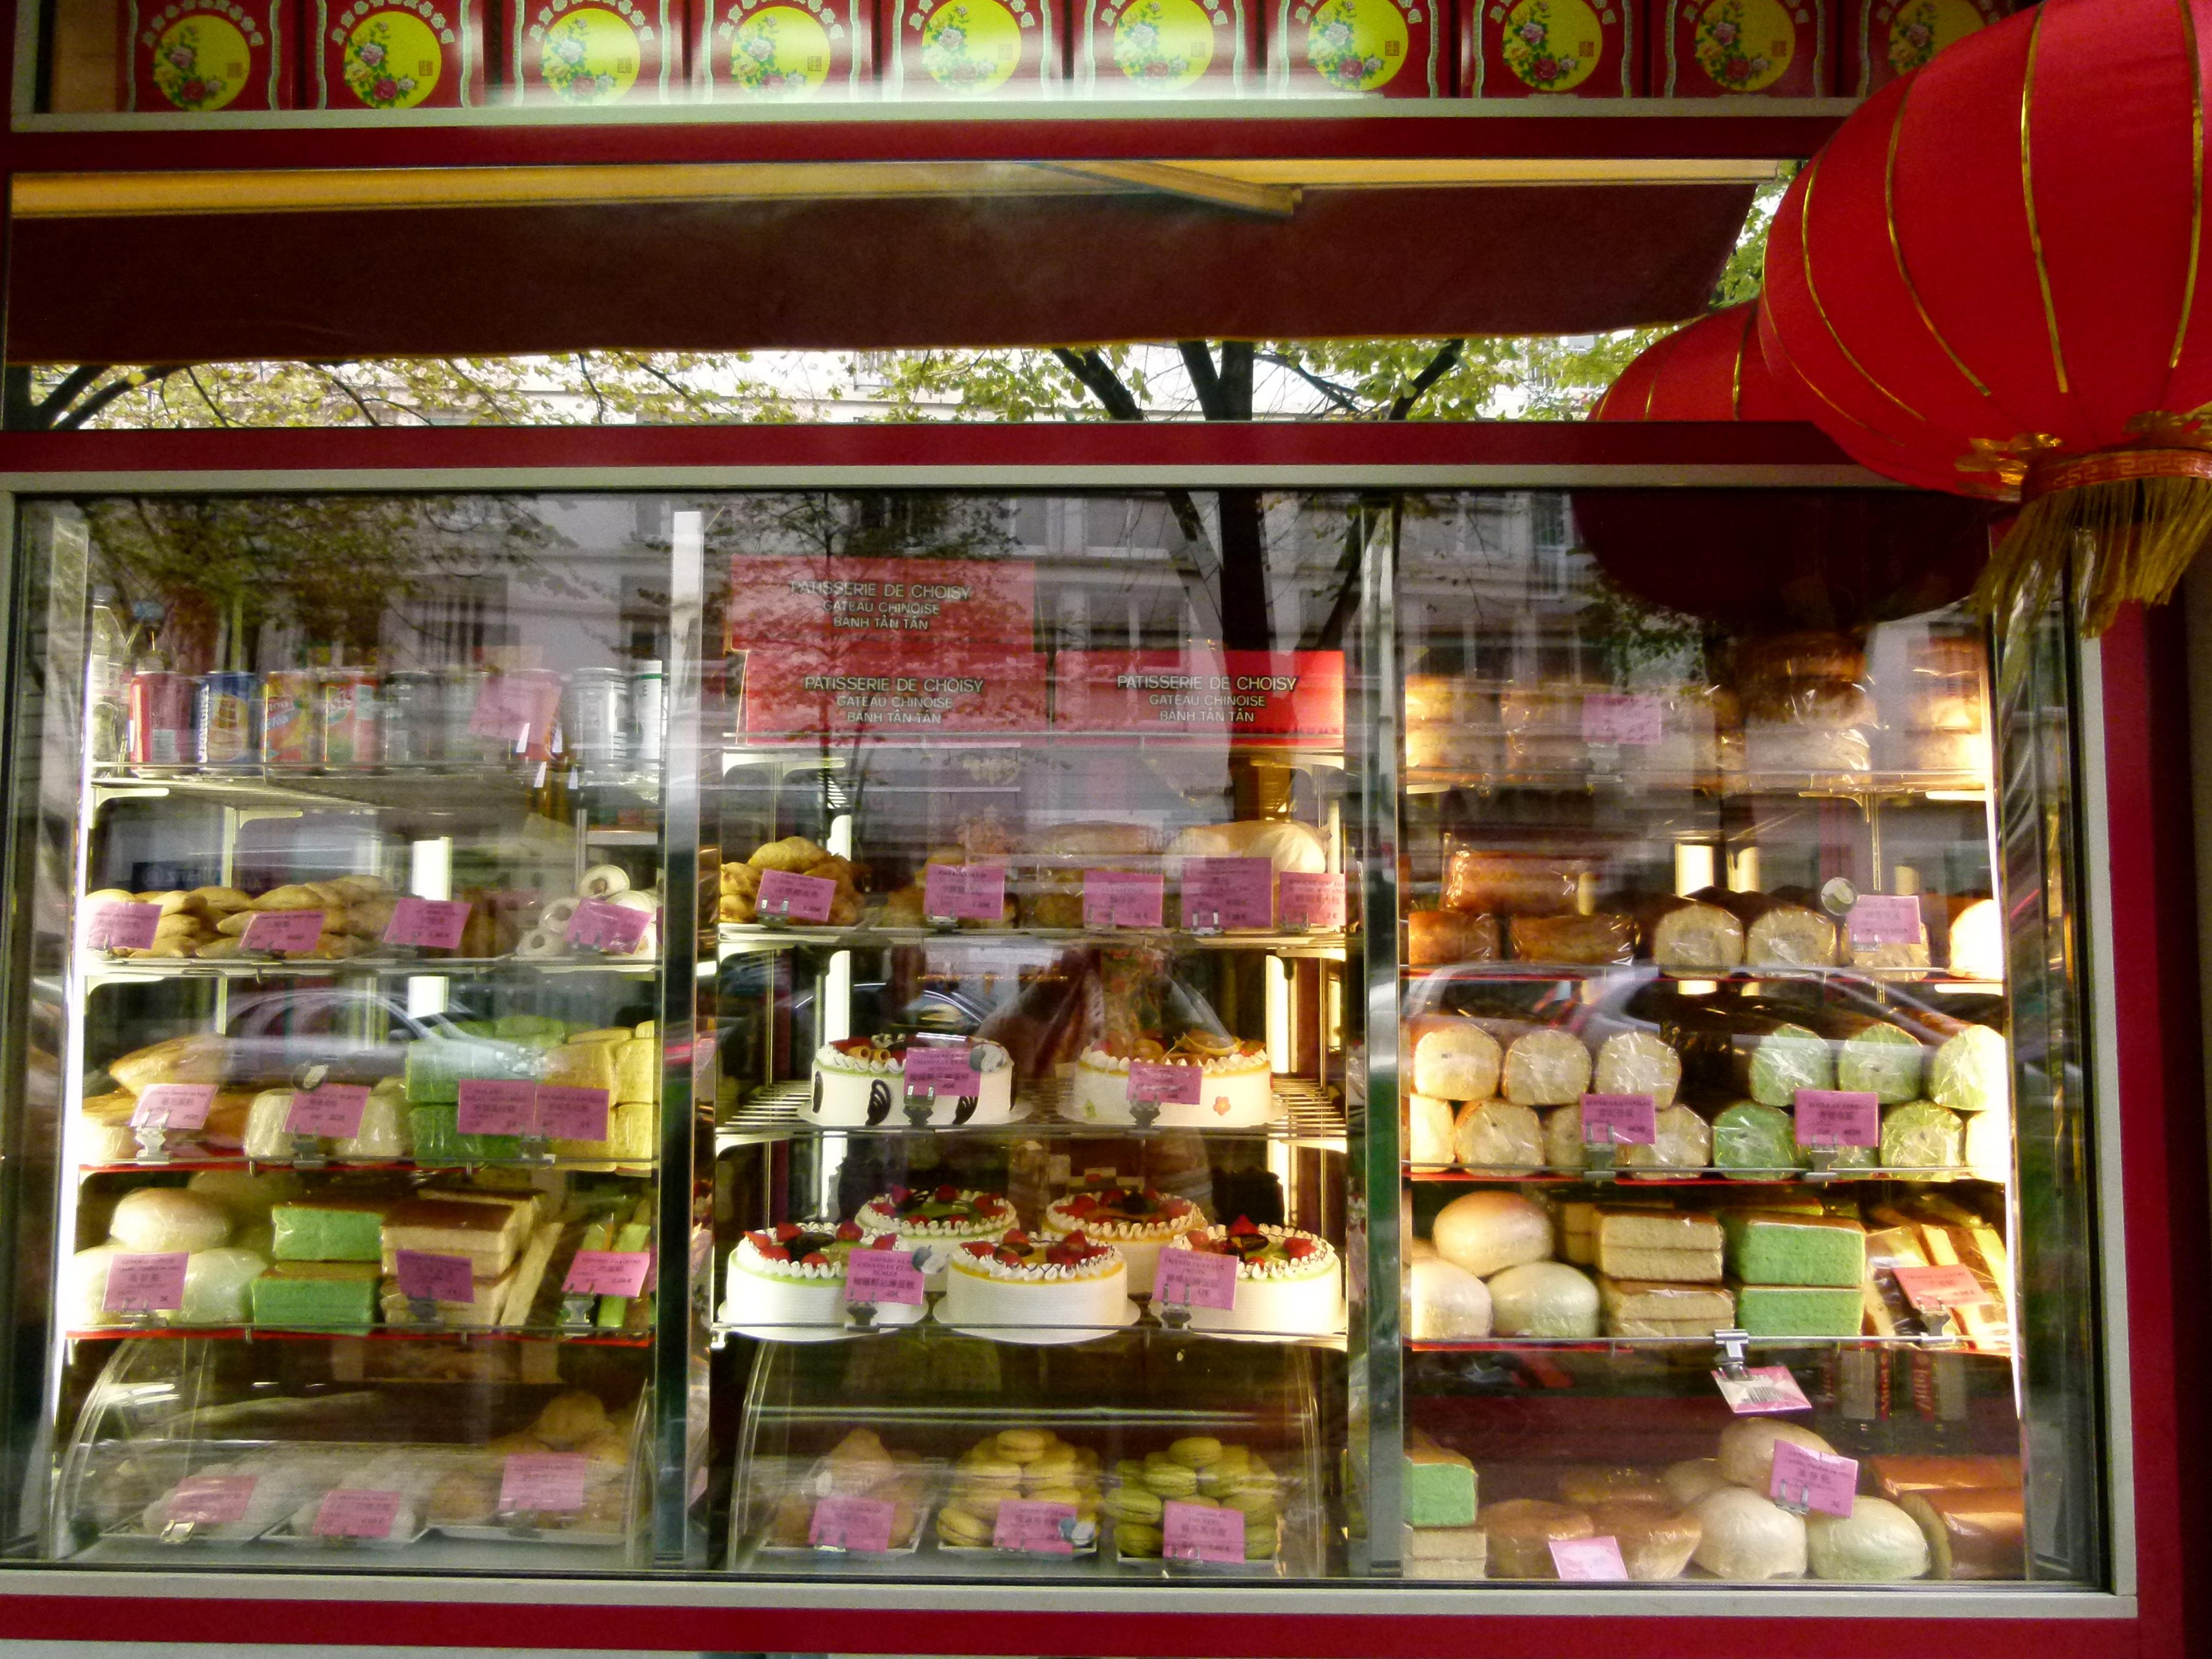 FileVitrine de patisserie chinoise avenue de Choisy.JPG